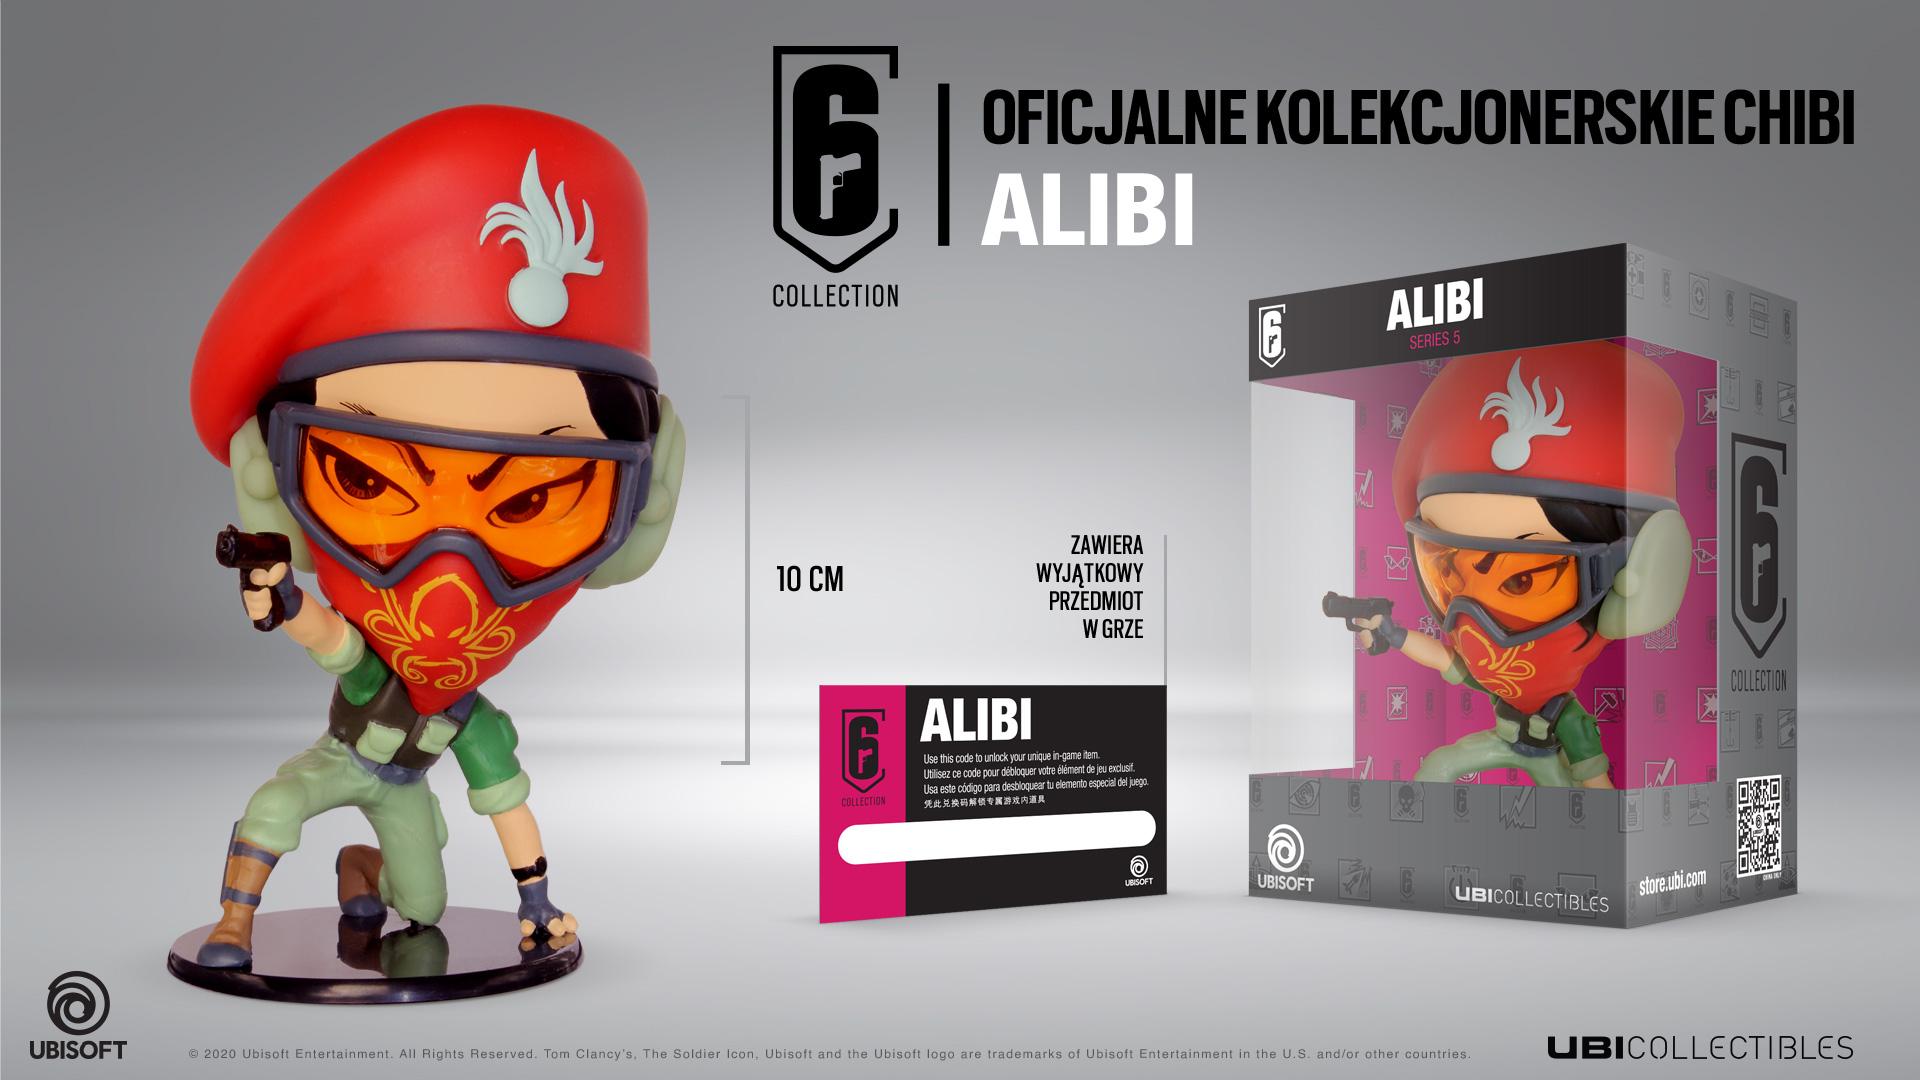 Collectibles: Rainbow Six Siege - Alibi Figurka